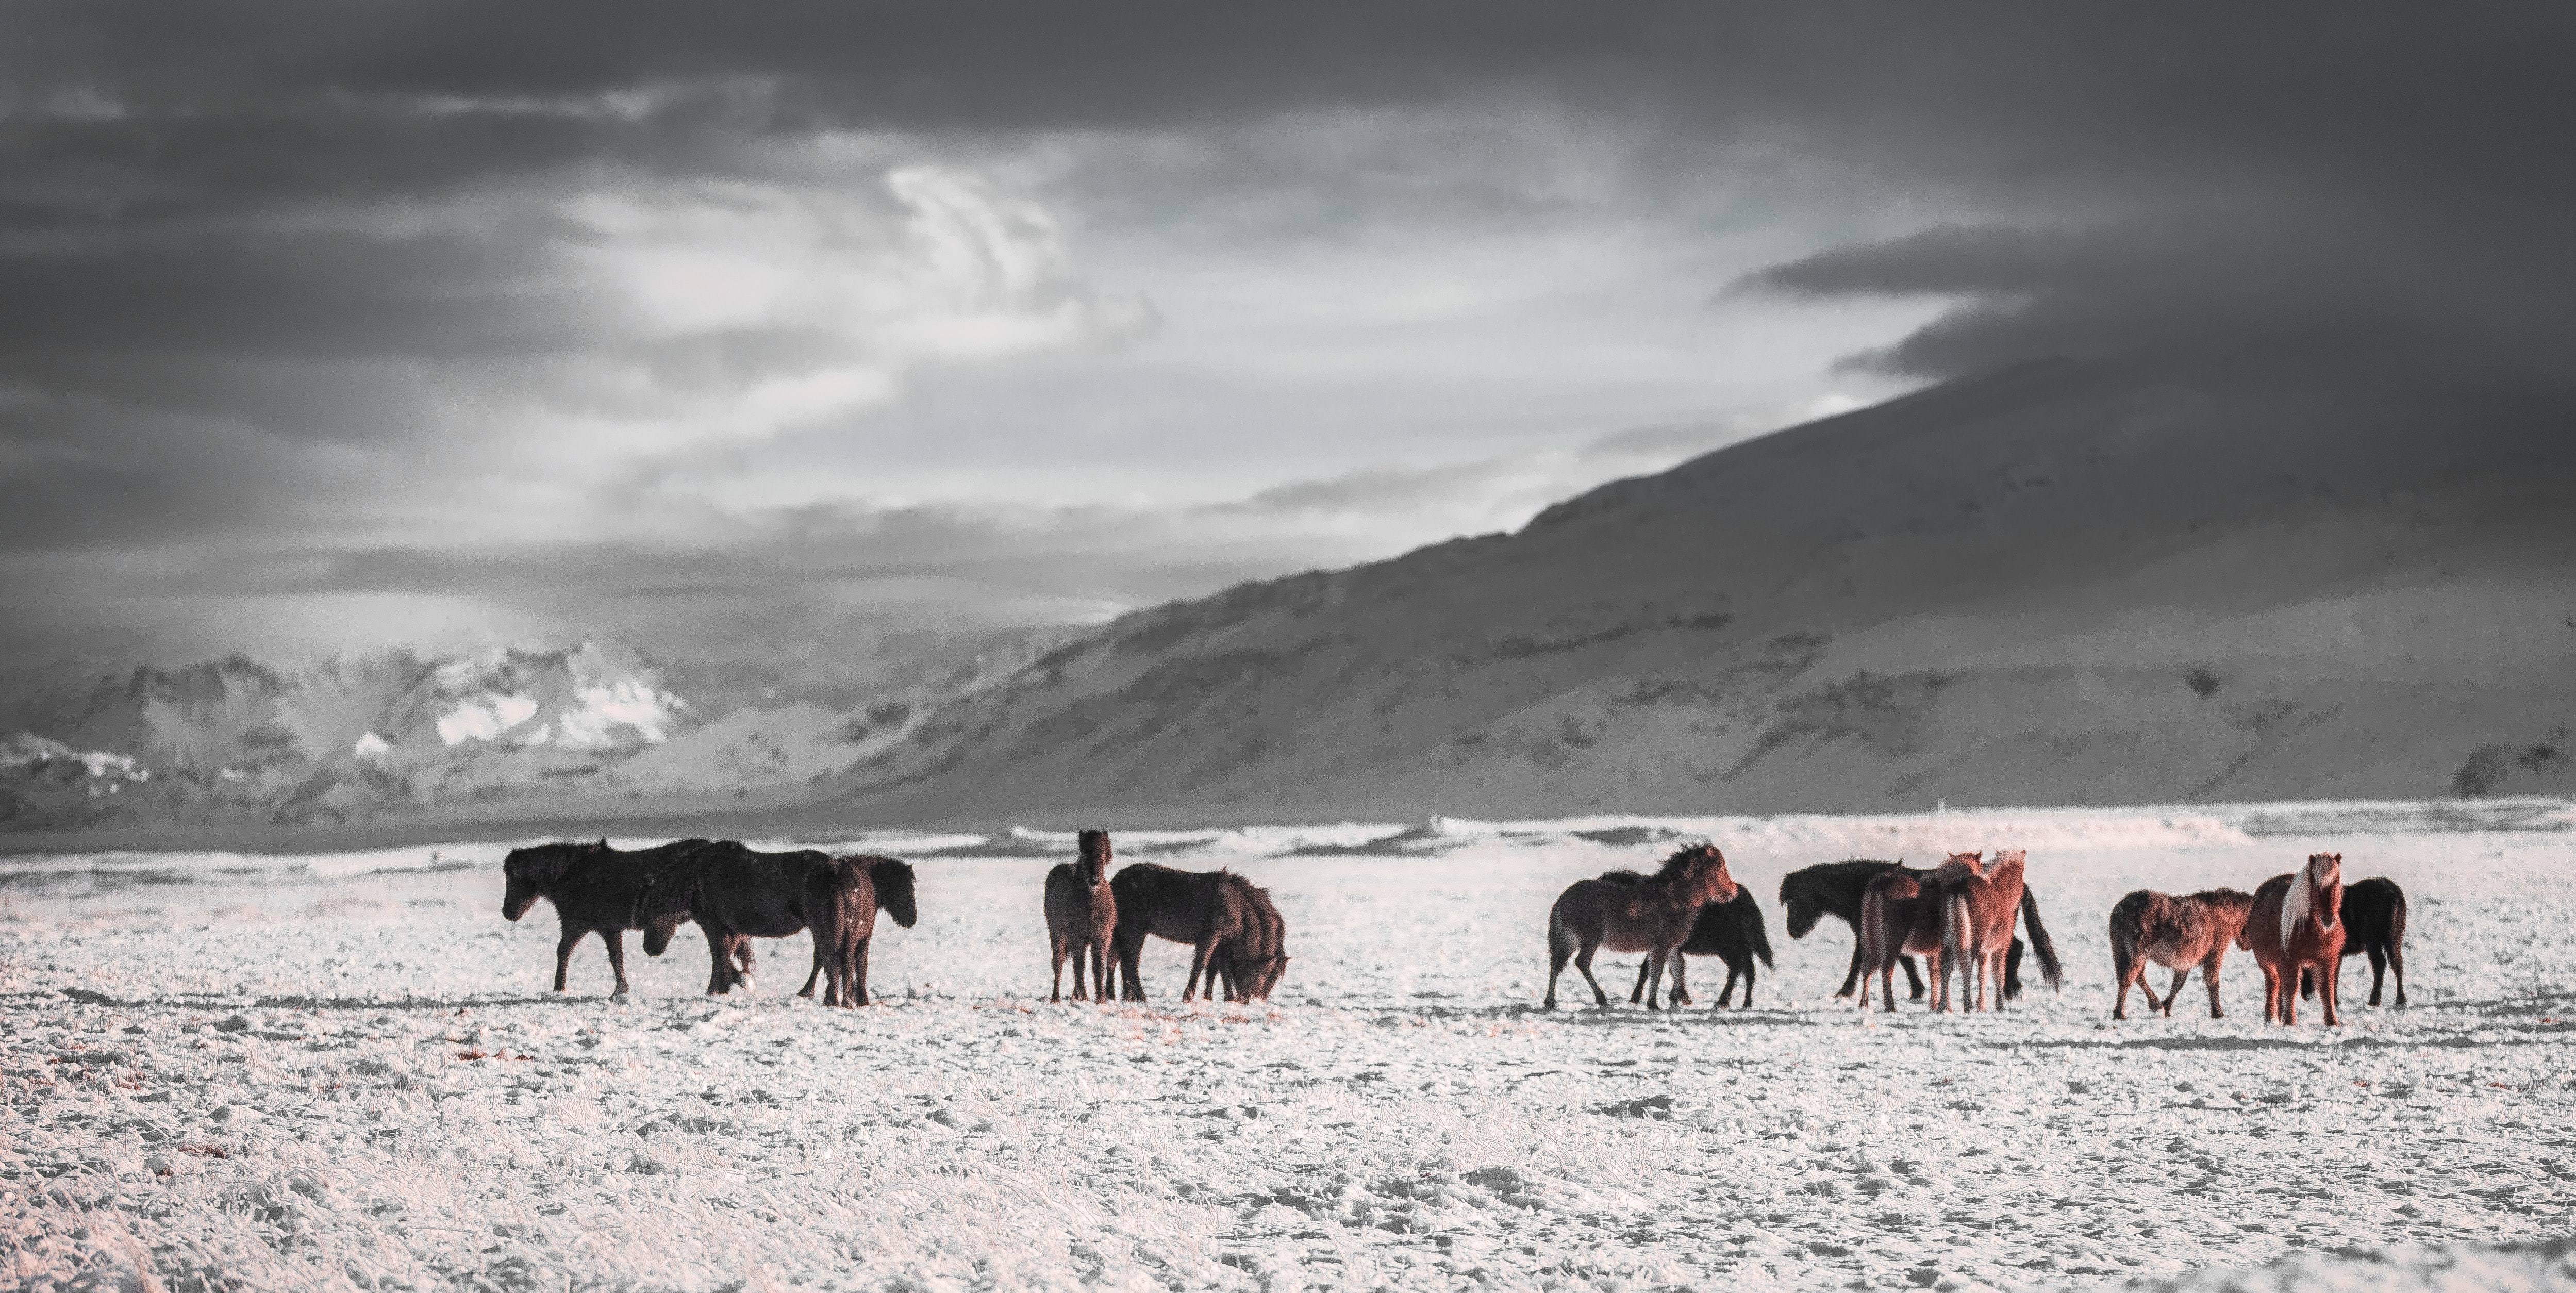 team of horses on white snow field under grey sky